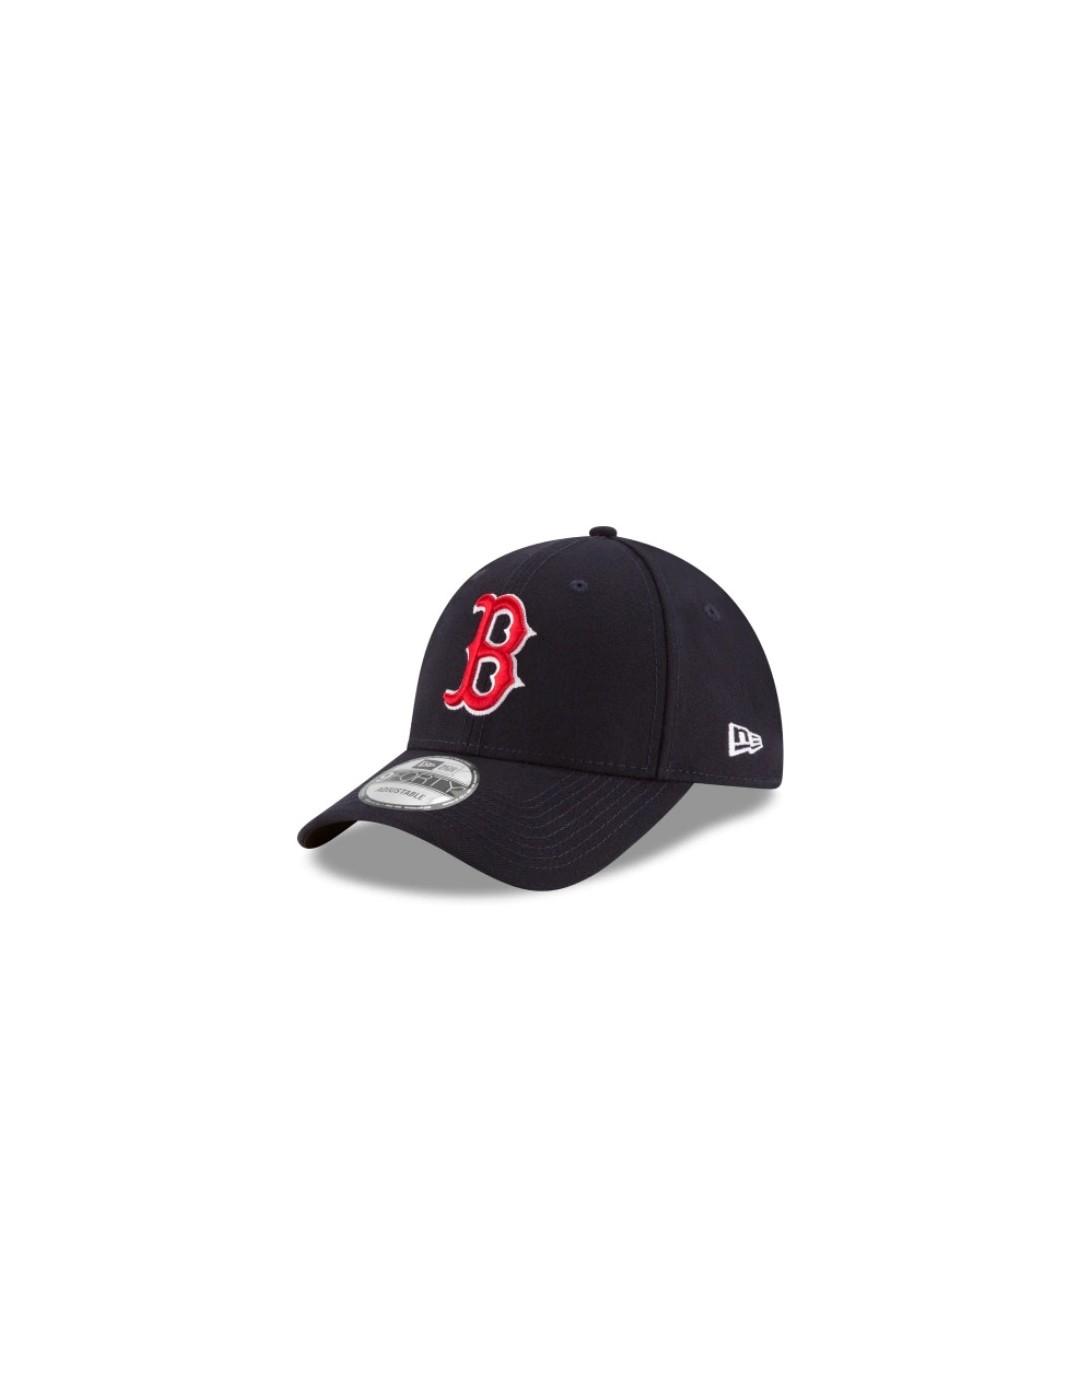 GORRA NEW ERA BOSTON REDS NAVY